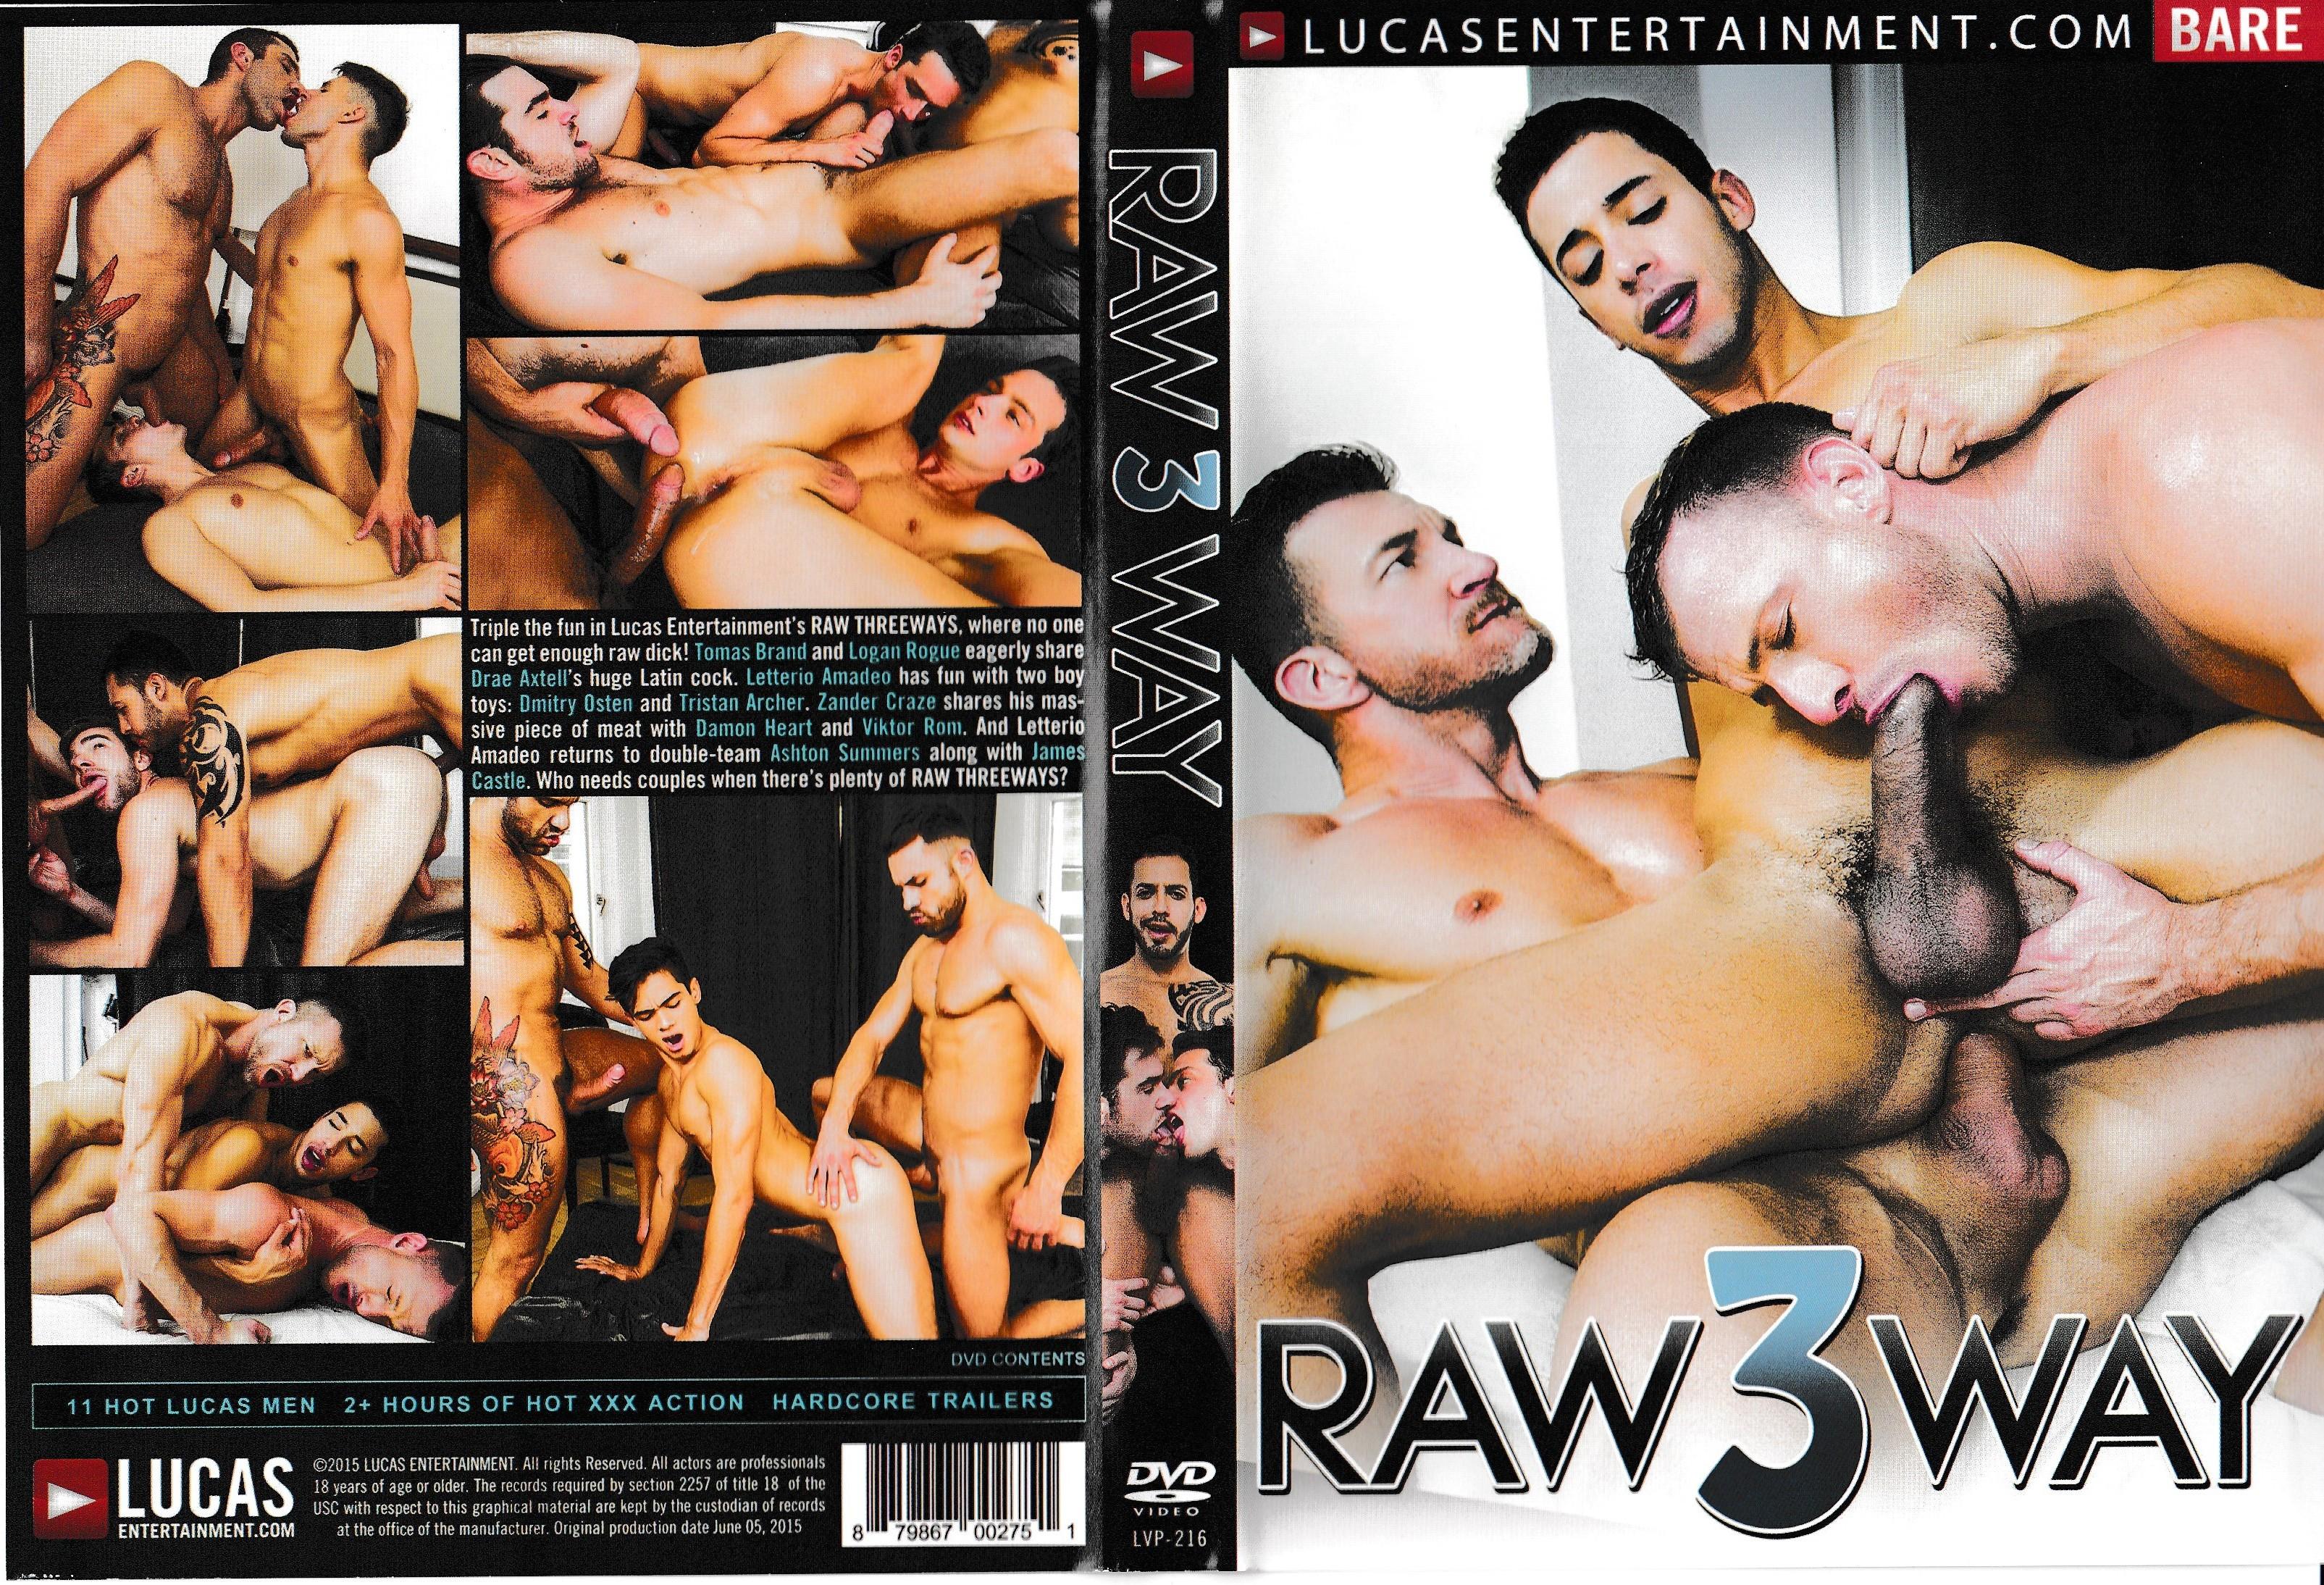 Ch 192: Raw 3 way